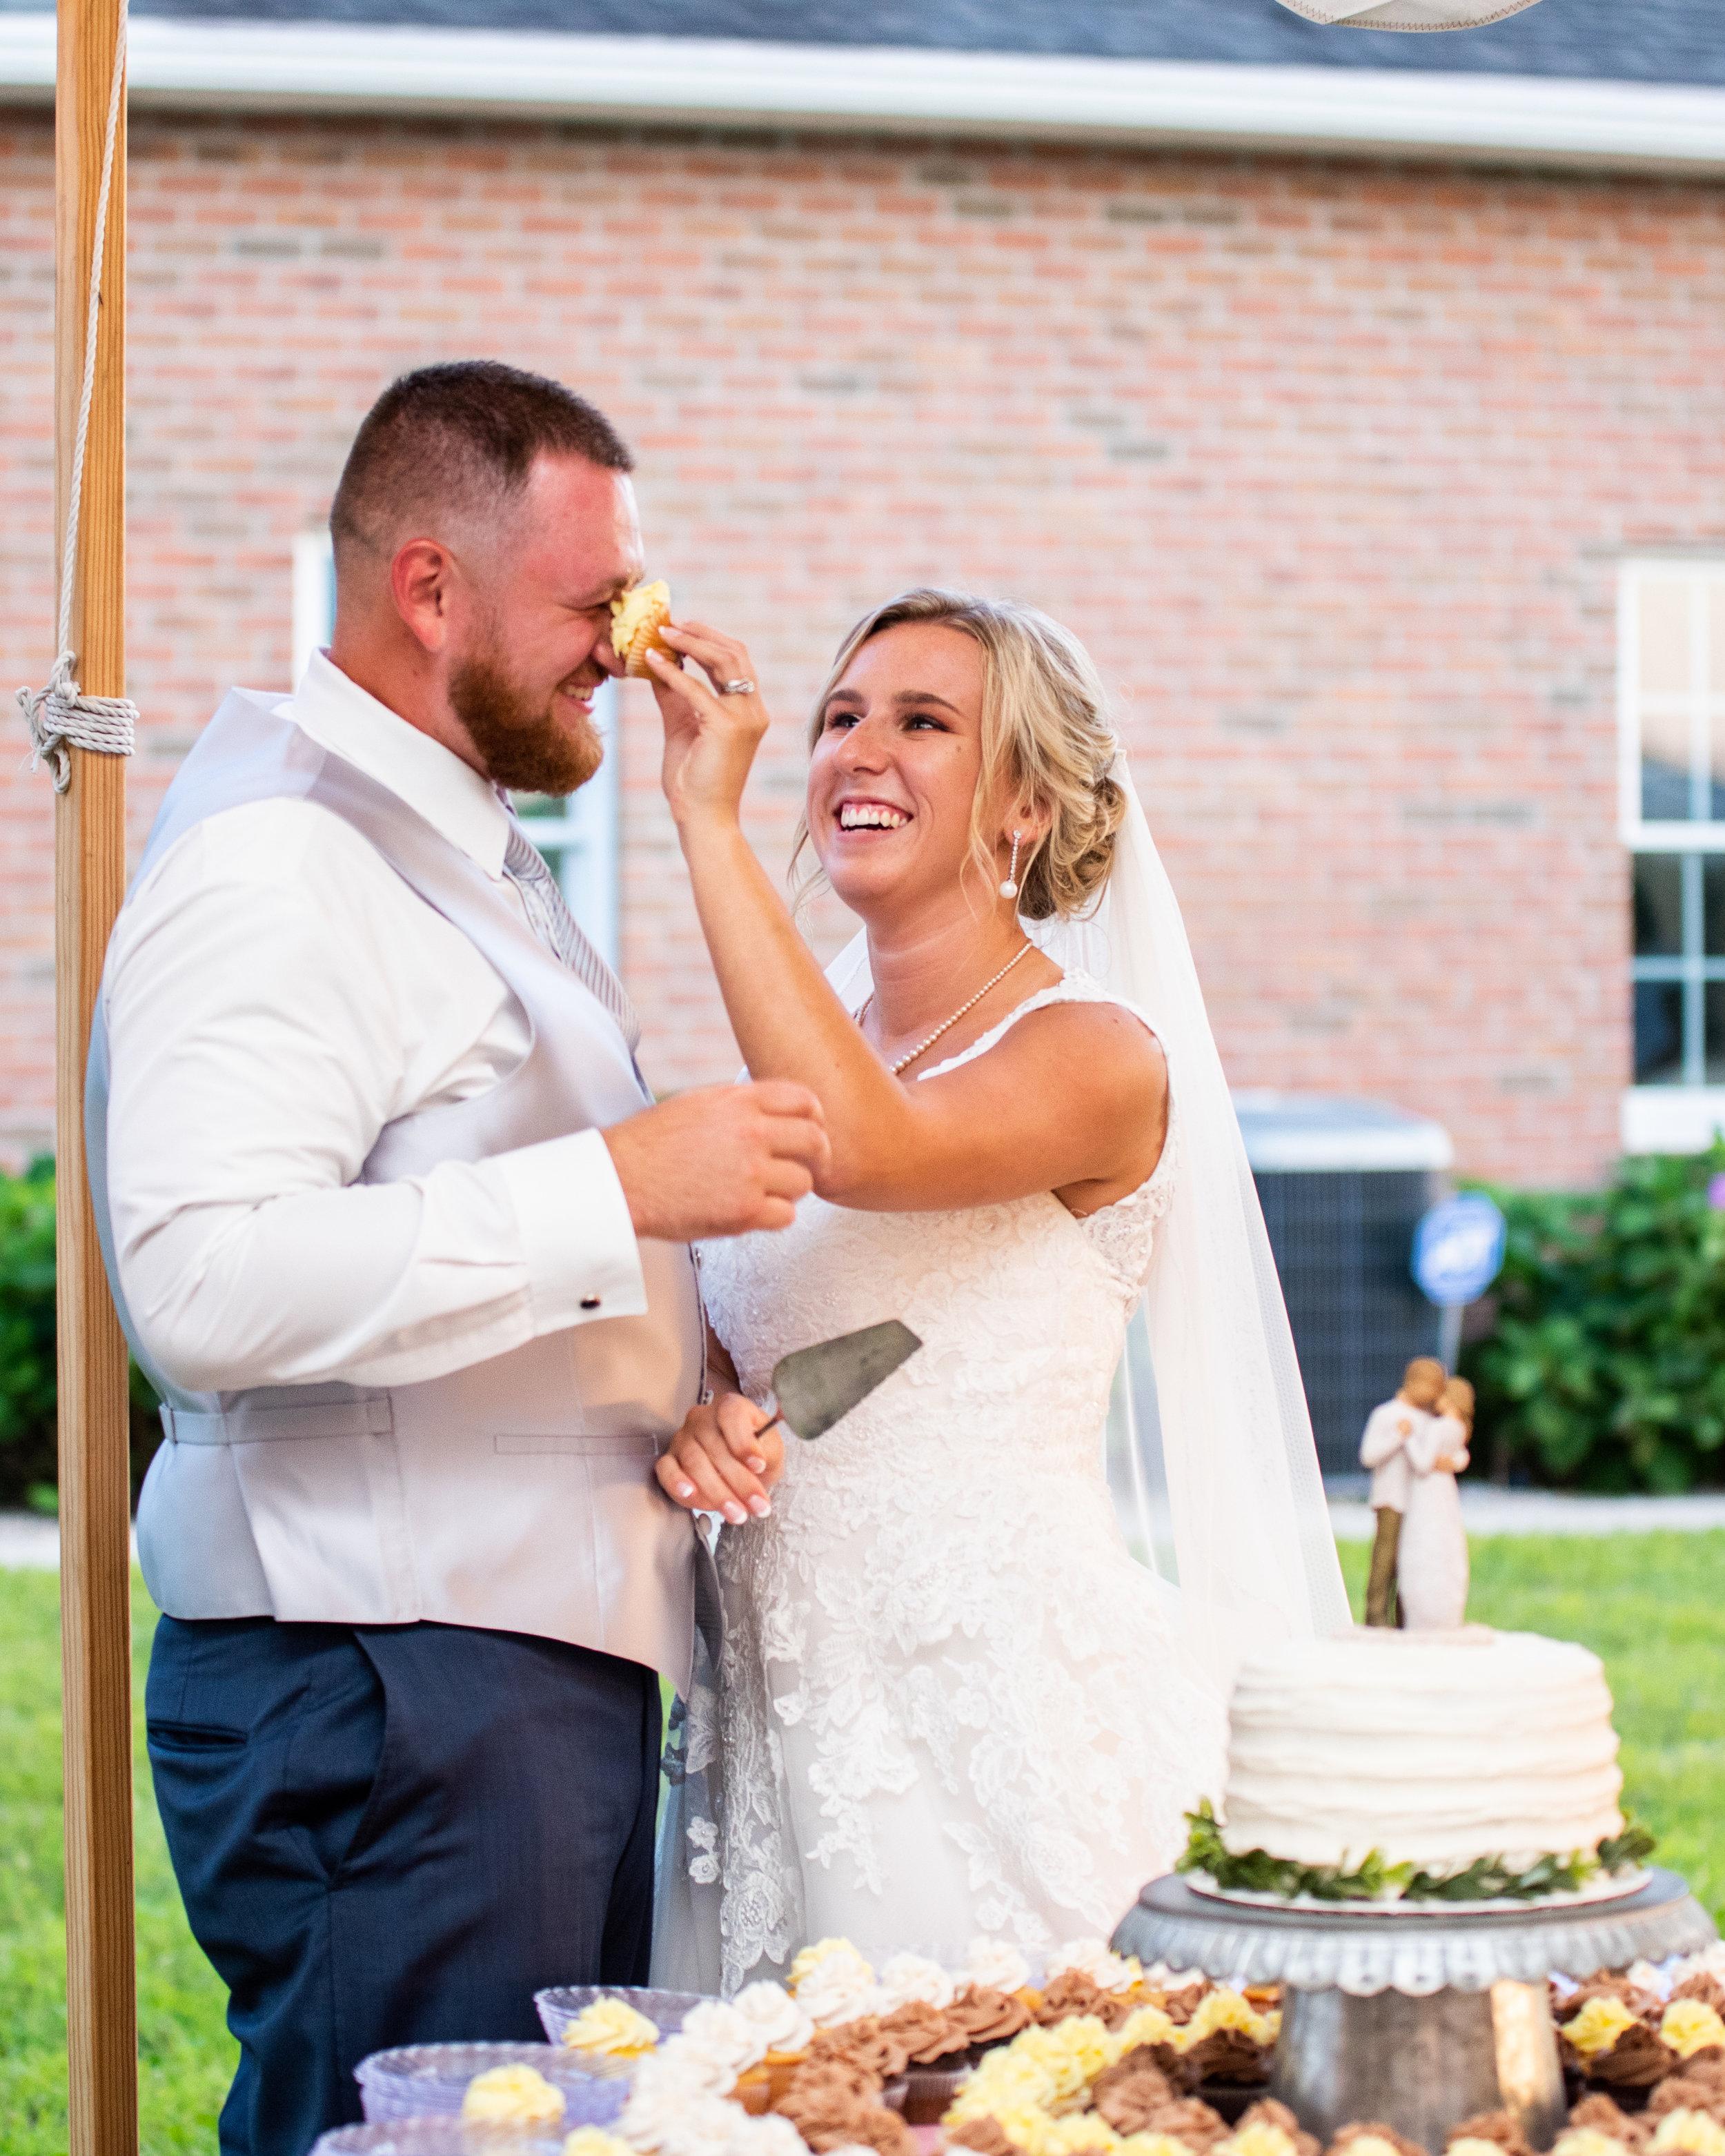 wedding (1 of 1)-217.jpg